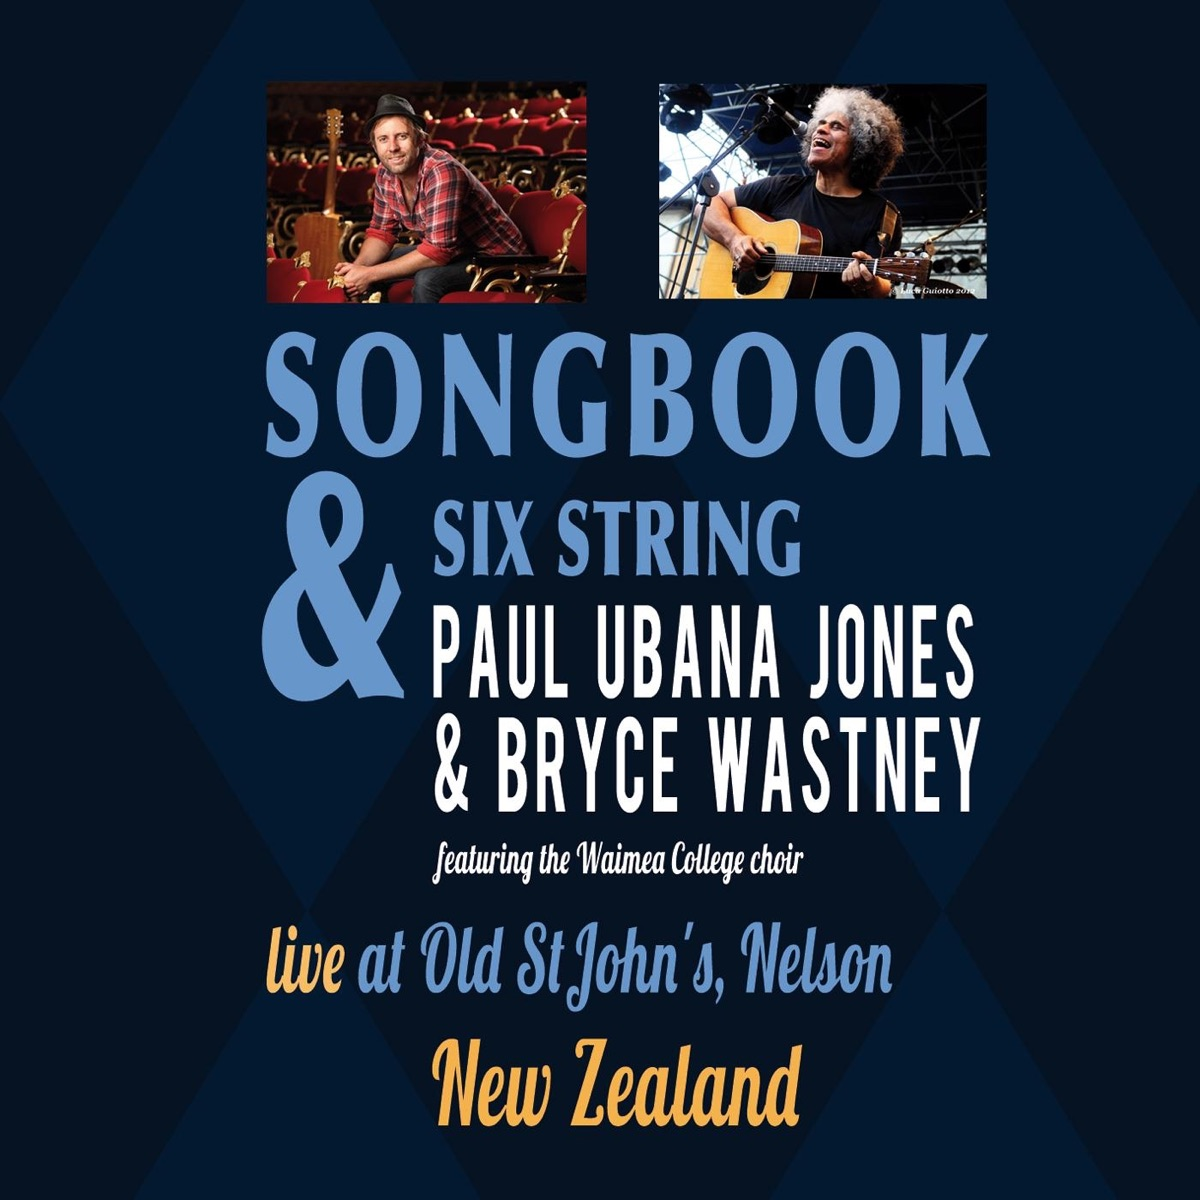 Songbook  Six String Paul Ubana Jones  Bryce Wastney Live At Old St Johns Nelson New Zealand Paul Ubana Jones  Bryce Wastney CD cover